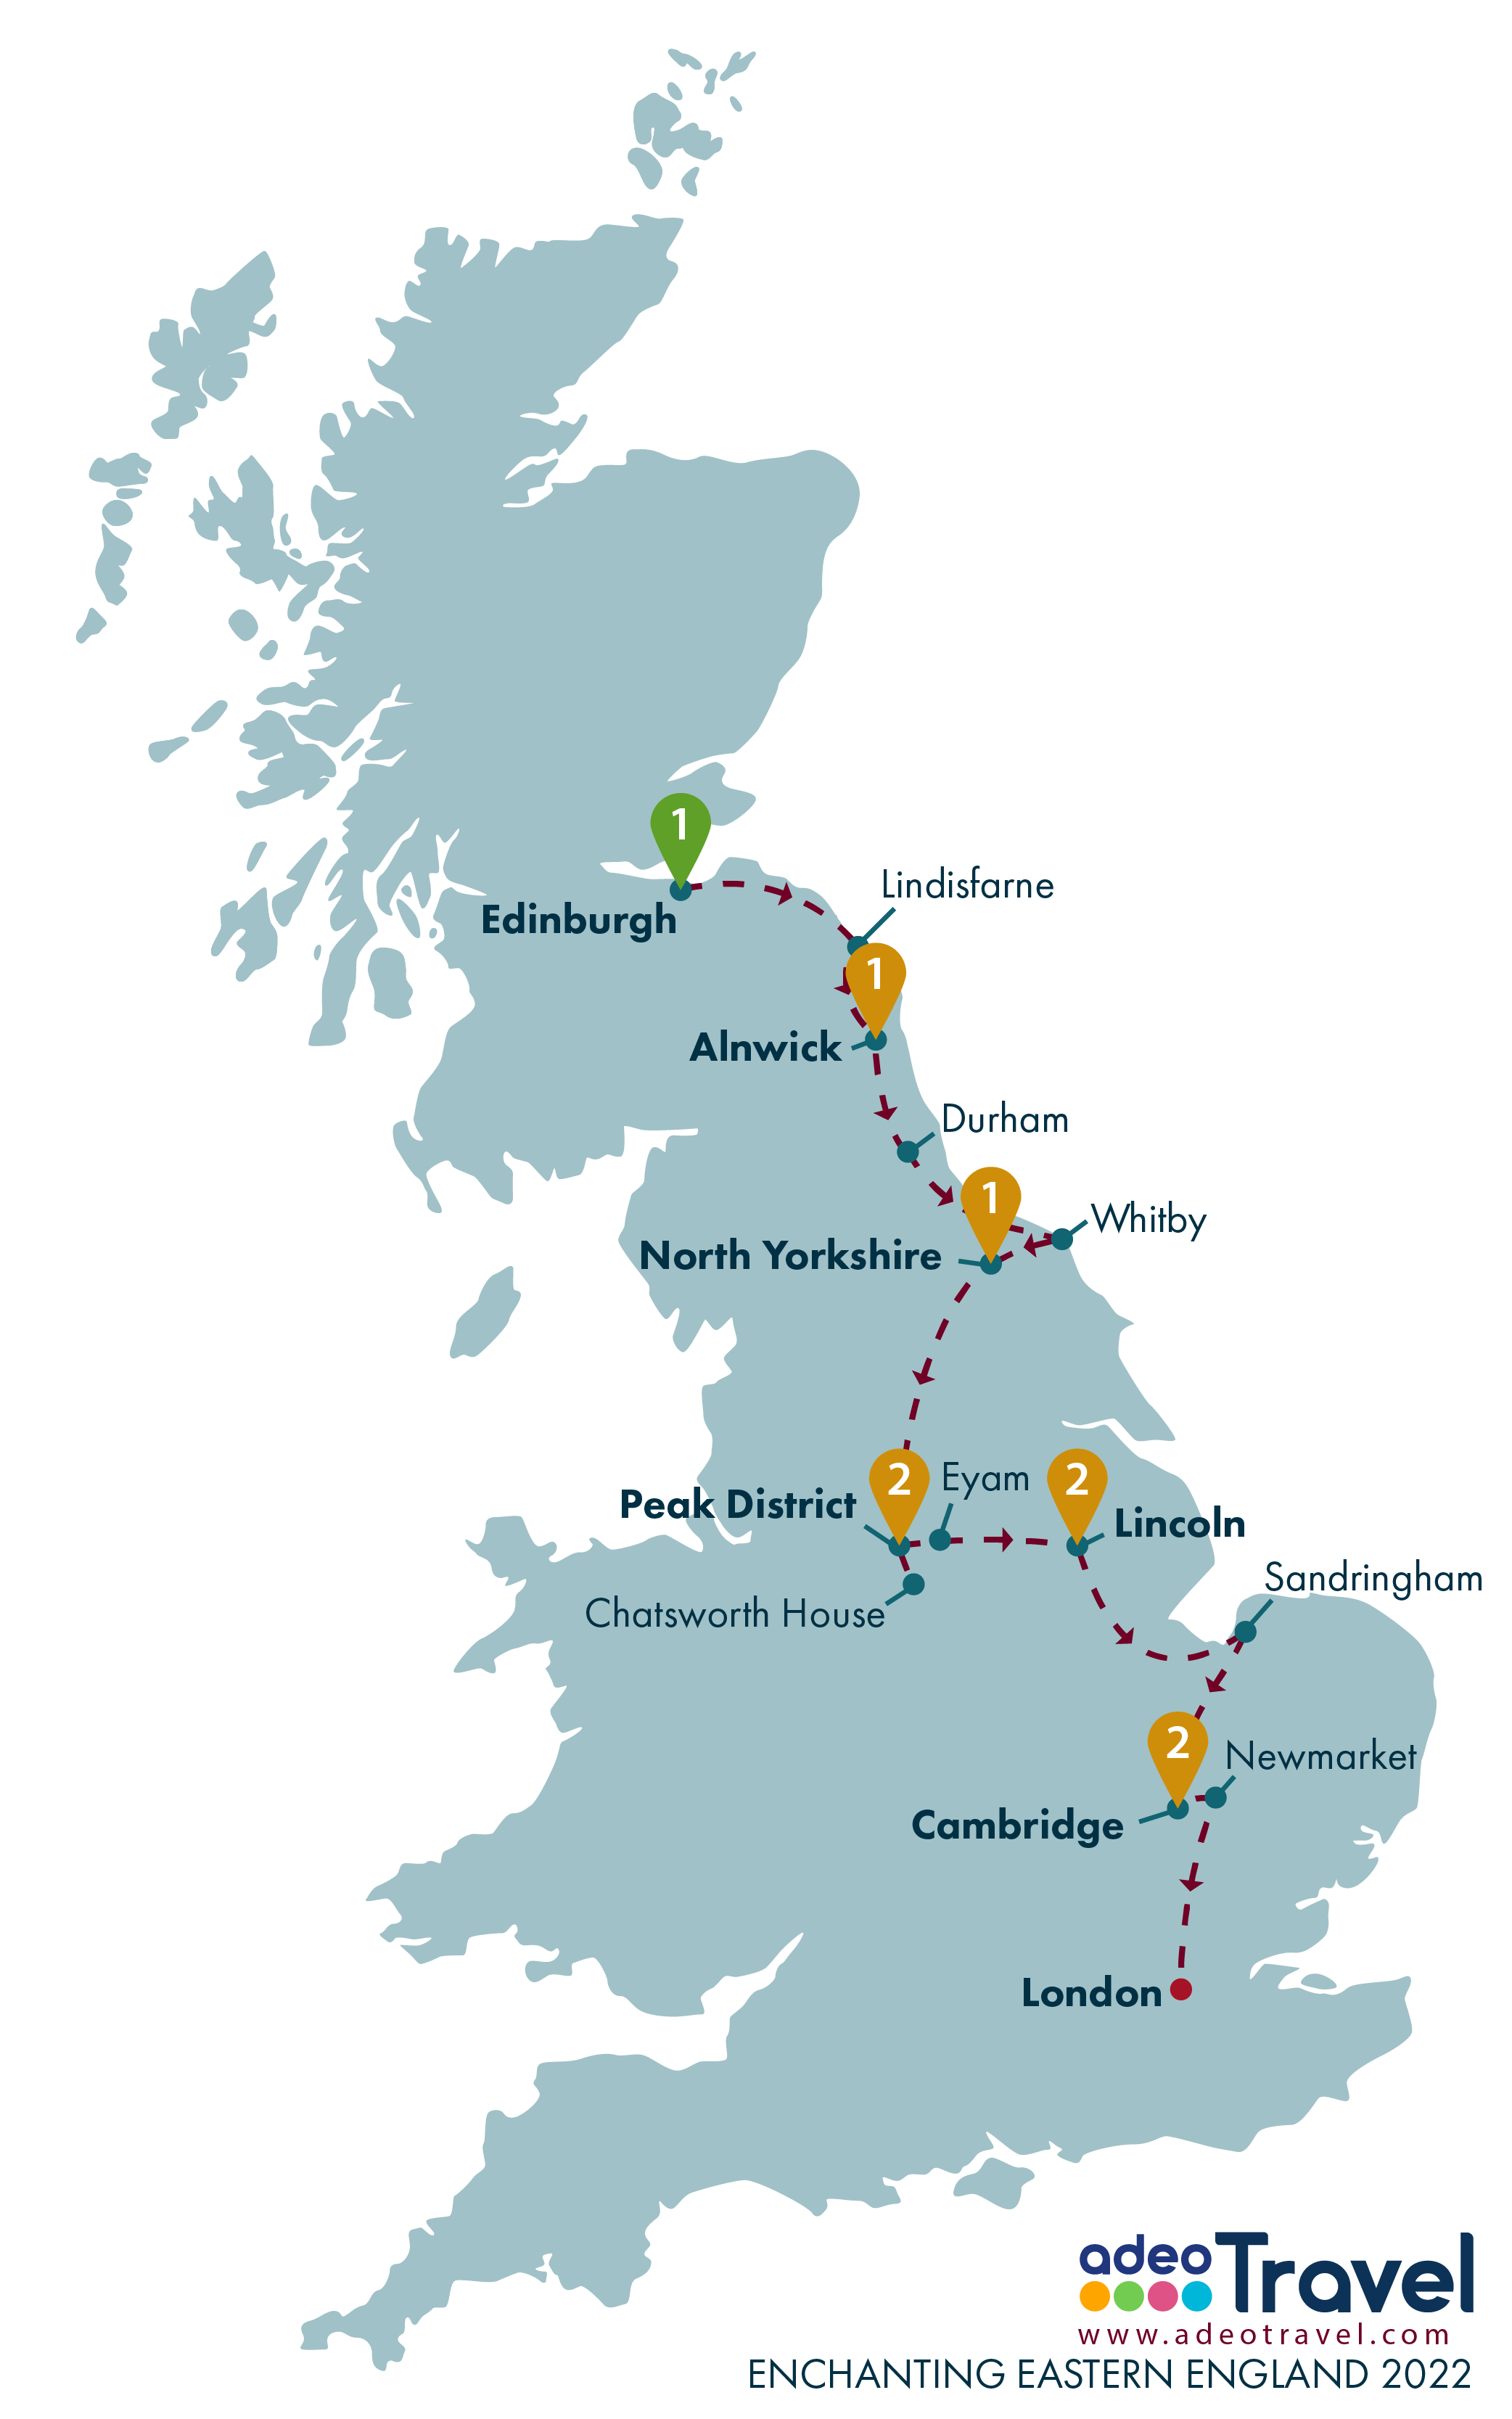 Map - Enchanting Eastern England 2022